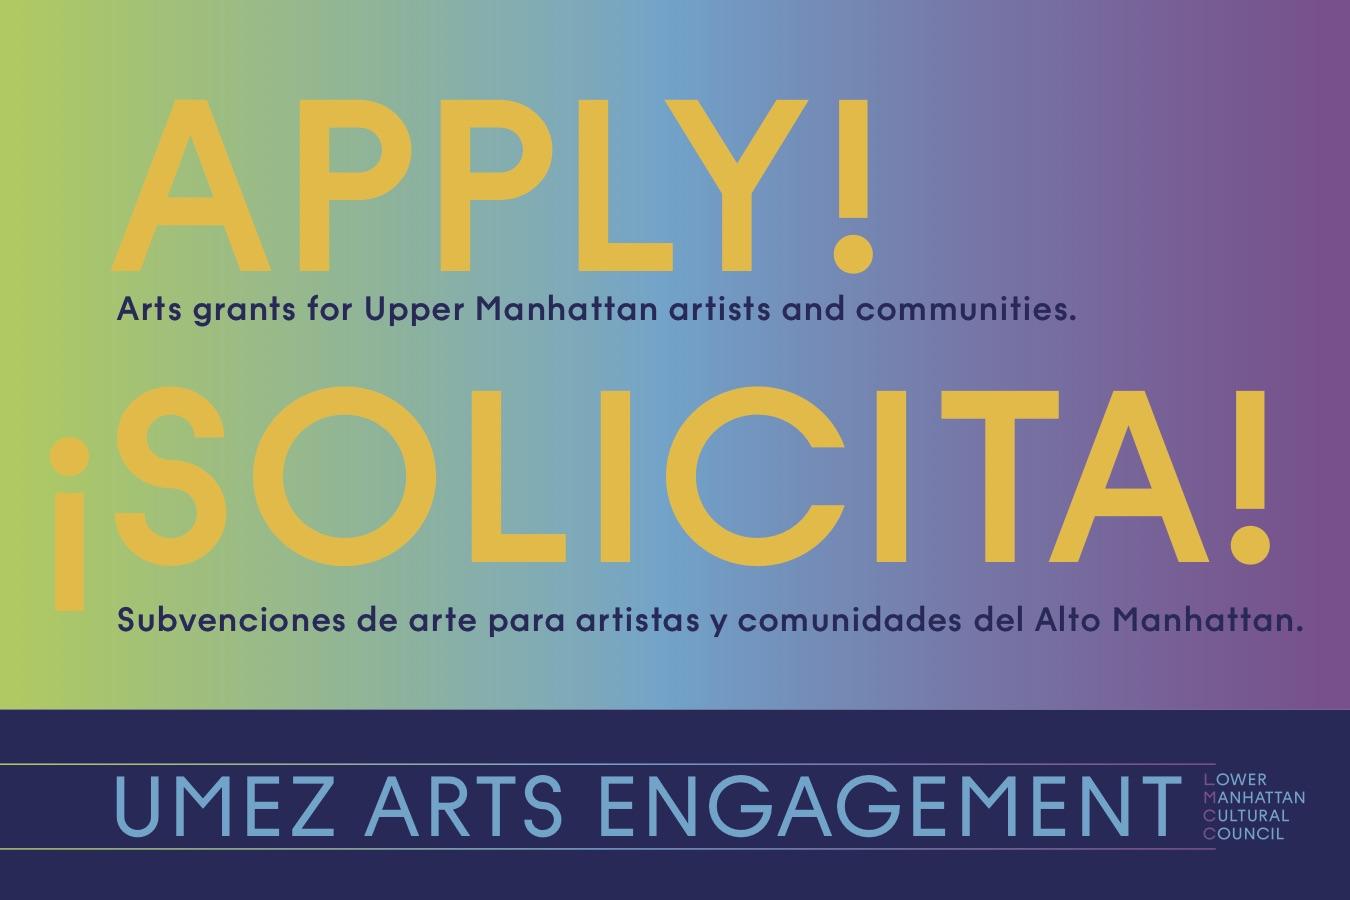 LMCC: Creative Engagement & UMEZ Arts Engagement